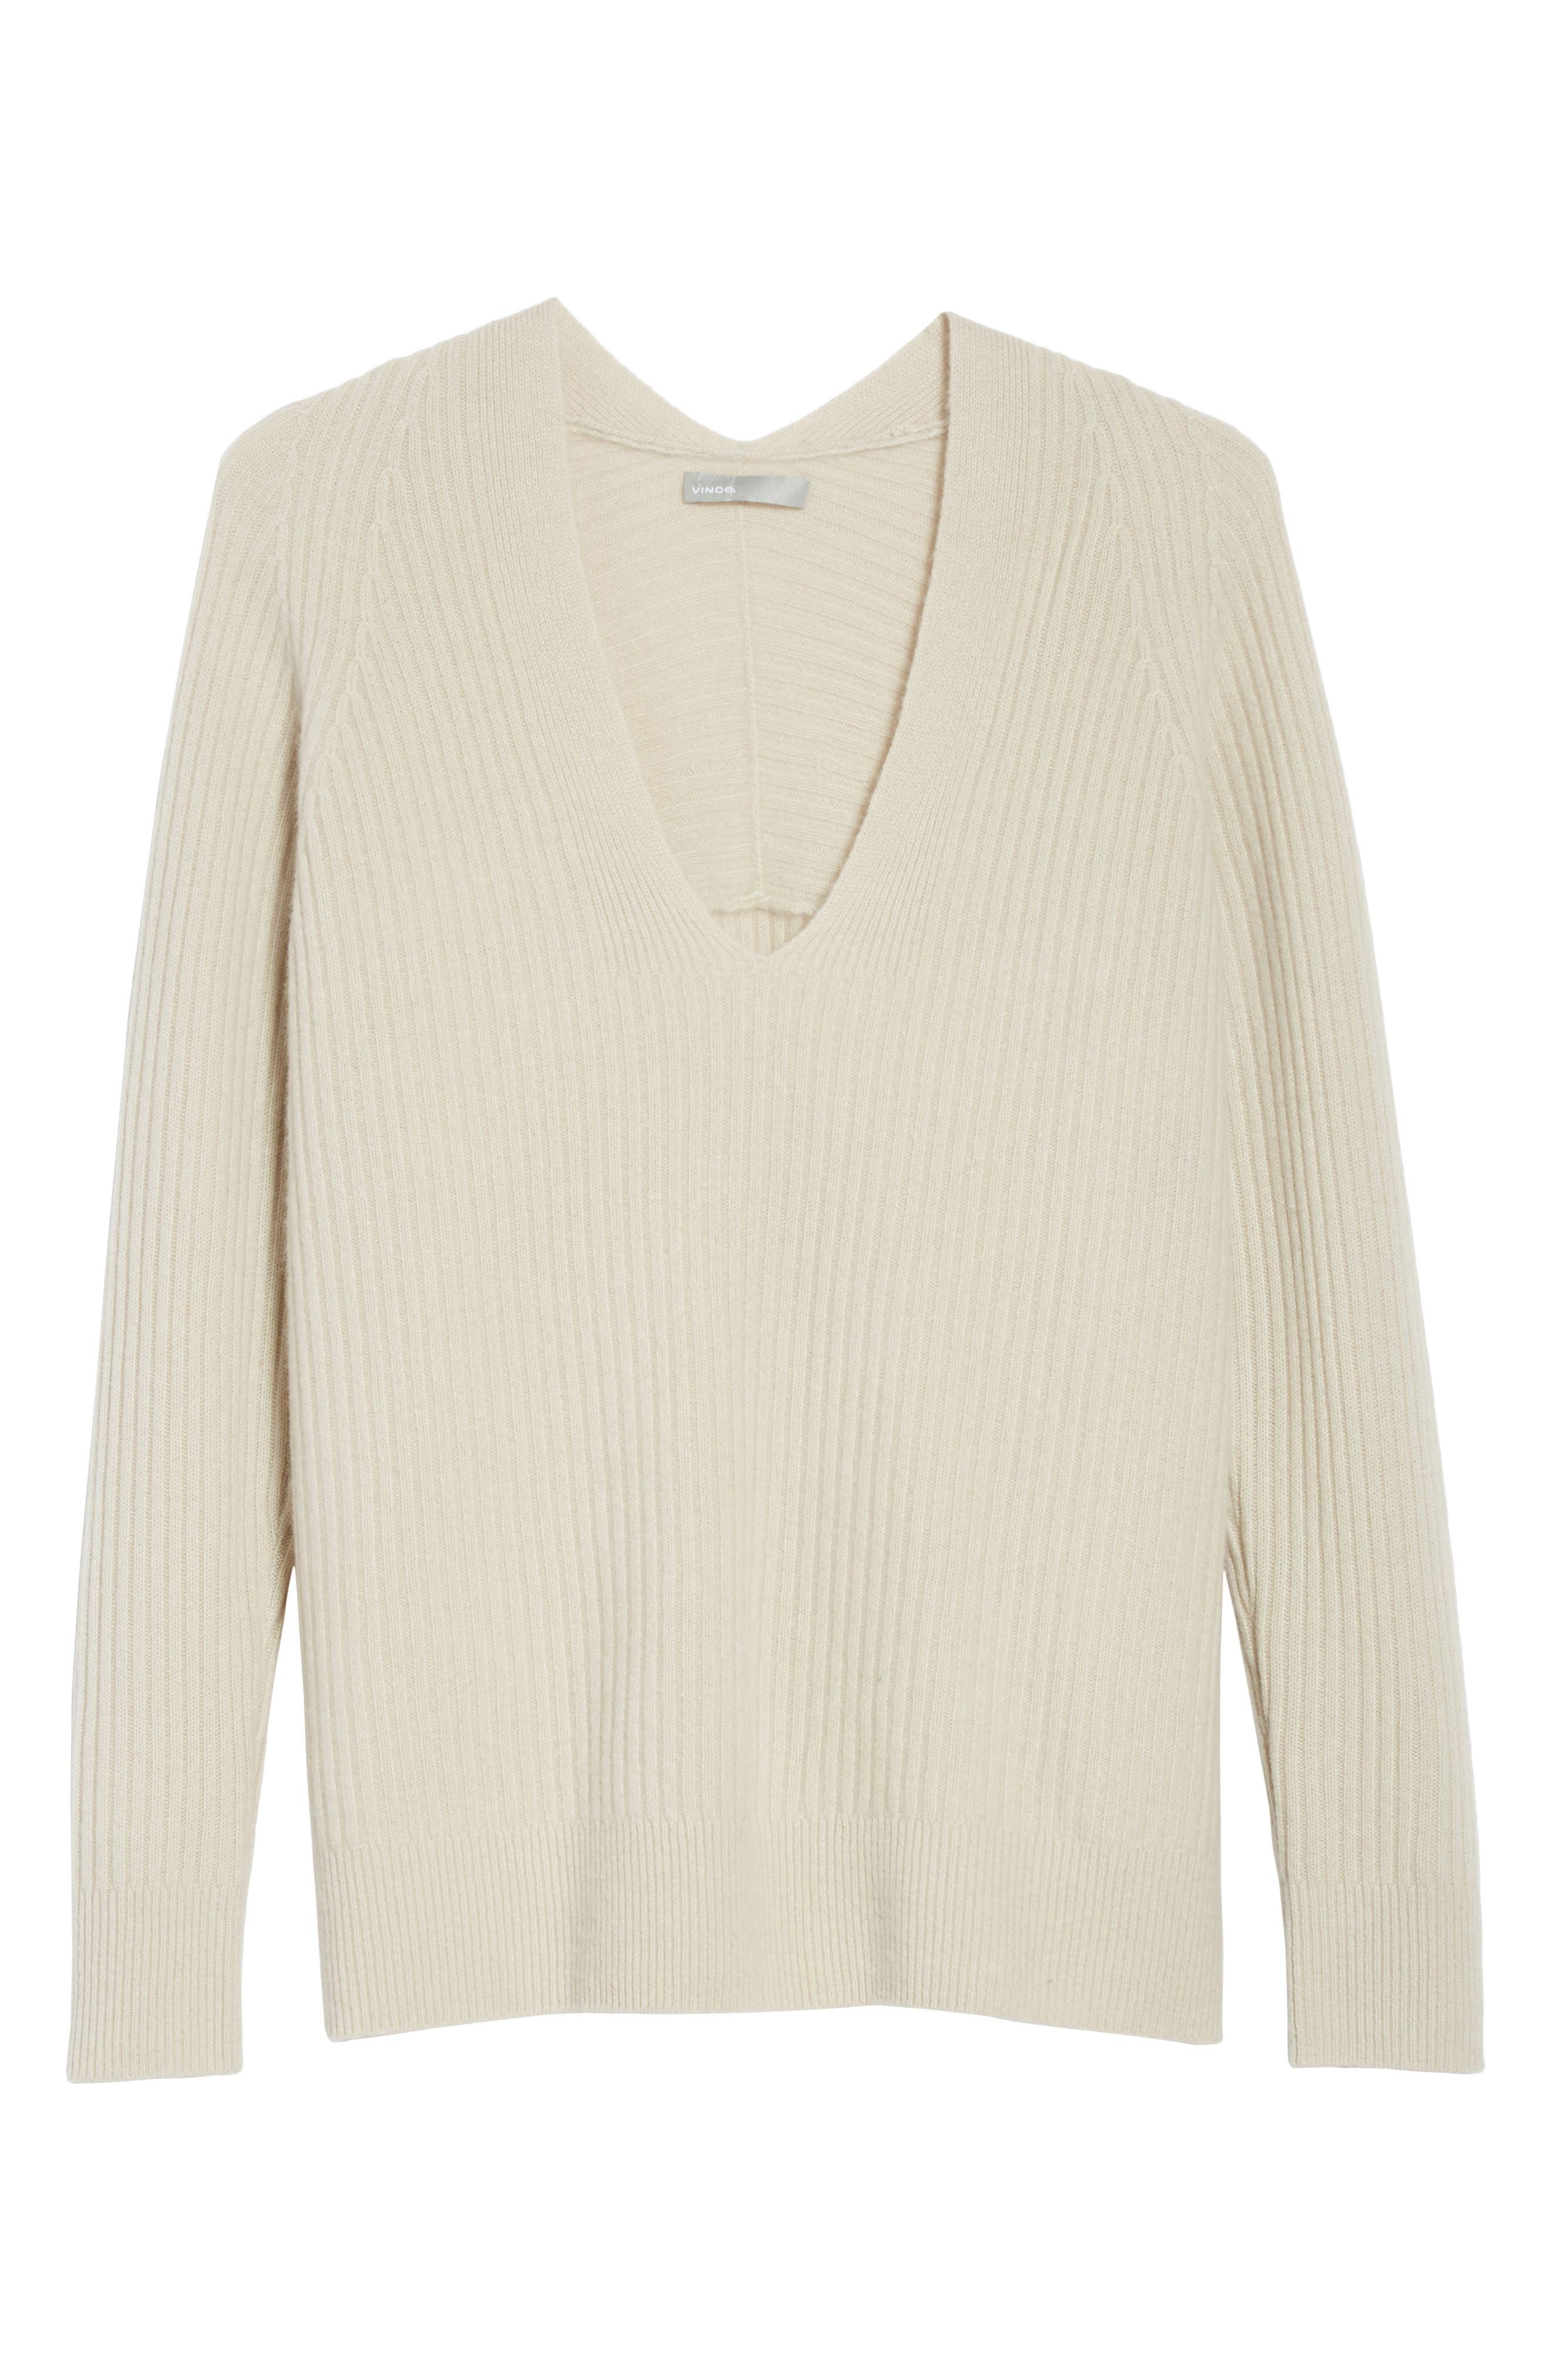 Wool Blend Raglan V-Neck Sweater,                             Alternate thumbnail 6, color,                             Chalet